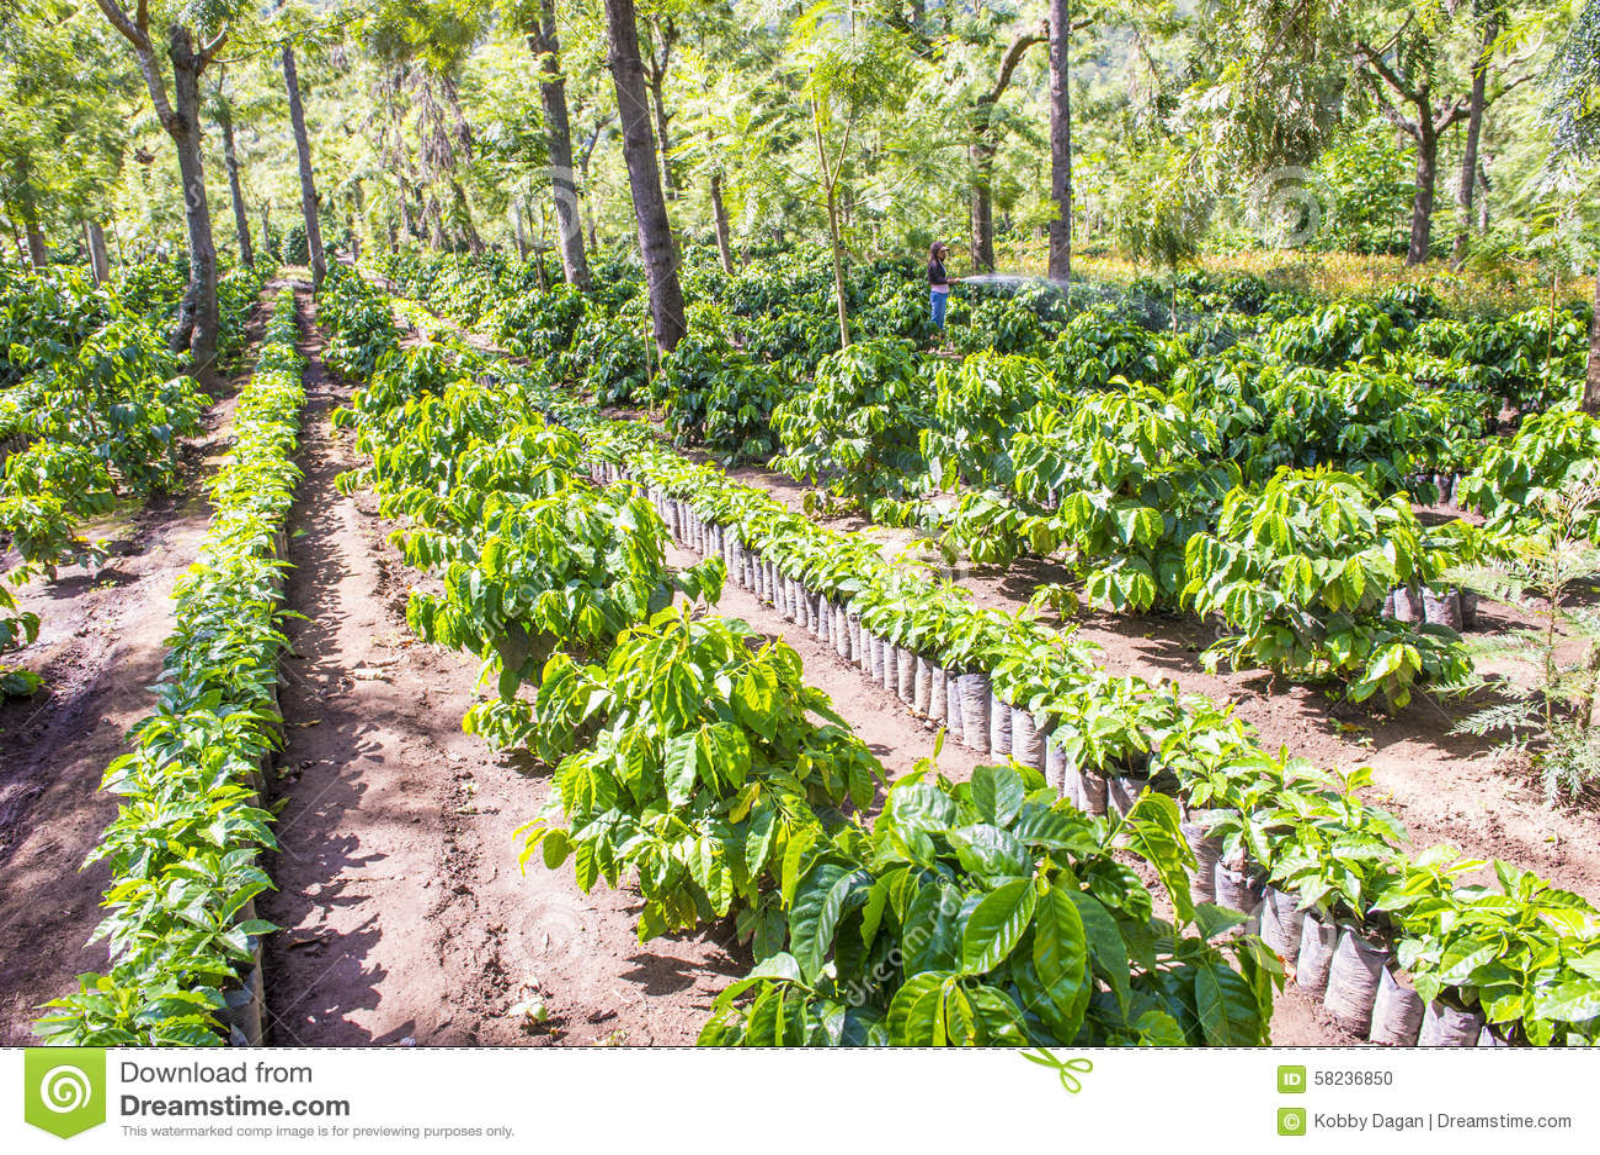 Guatemala Coffee Plantation Editorial Image - Image: 58236850